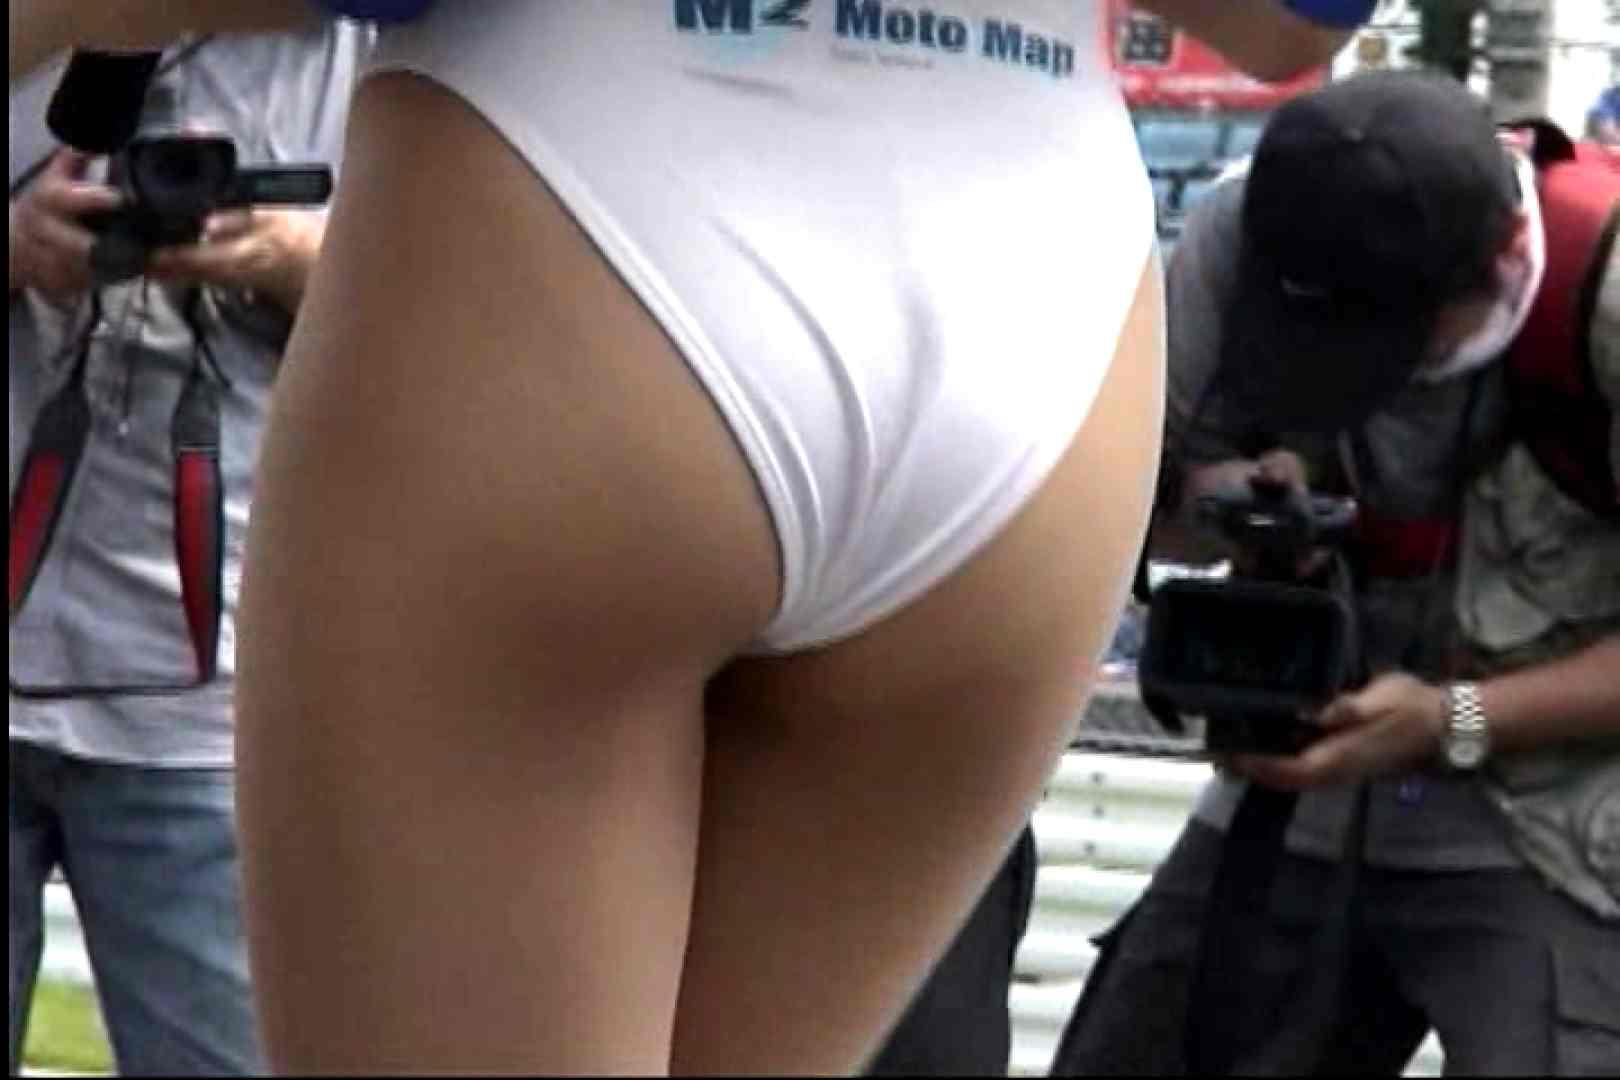 RQカメラ地獄Vol.5 レースクイーン編 | コスチューム  103画像 25